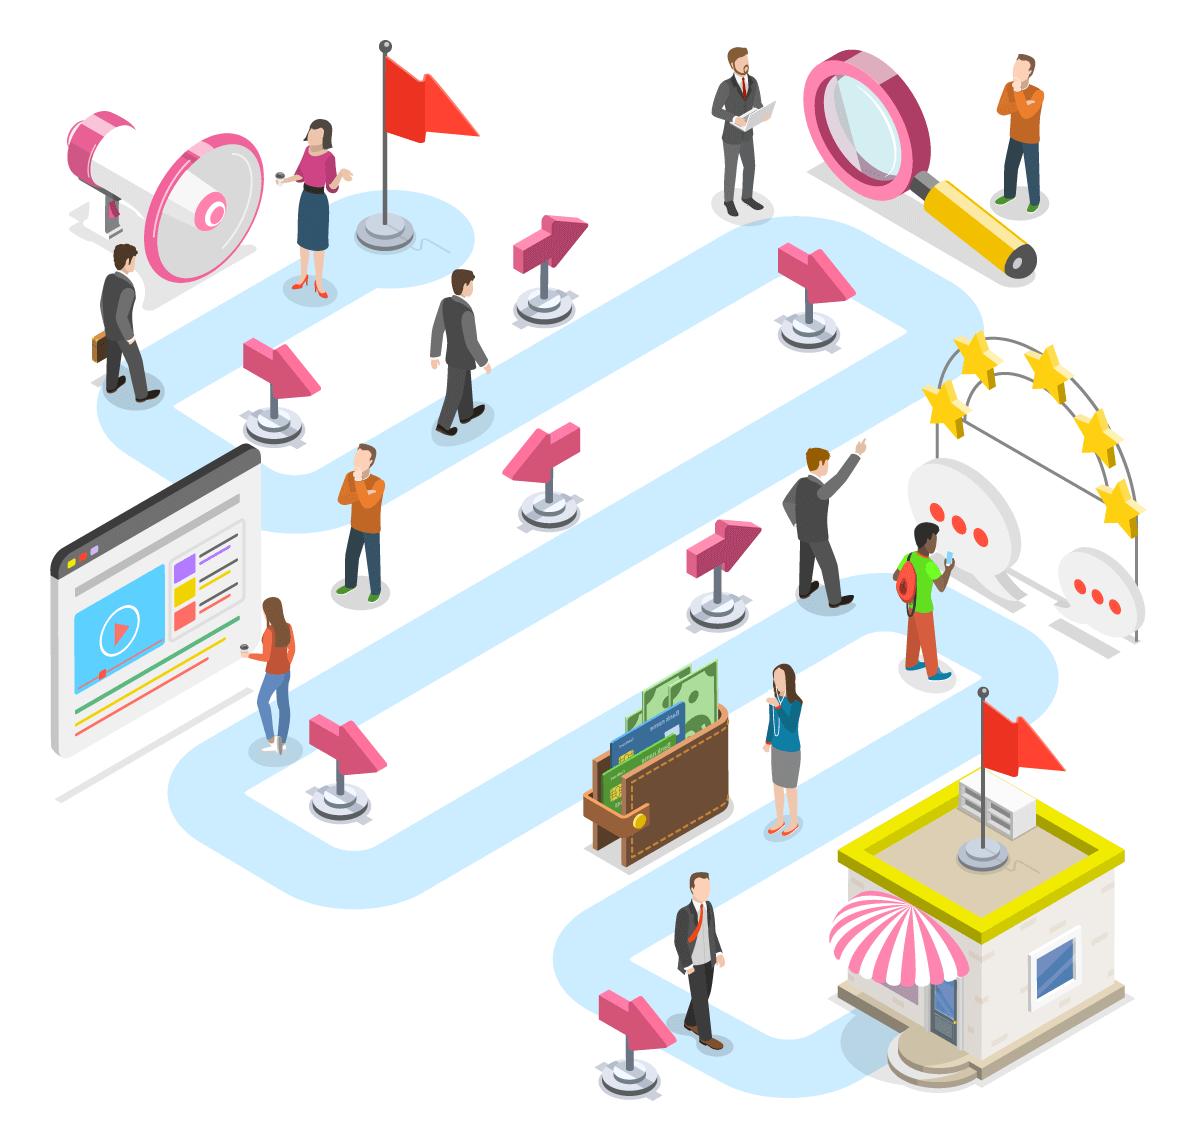 diagram of user journey concept in web design